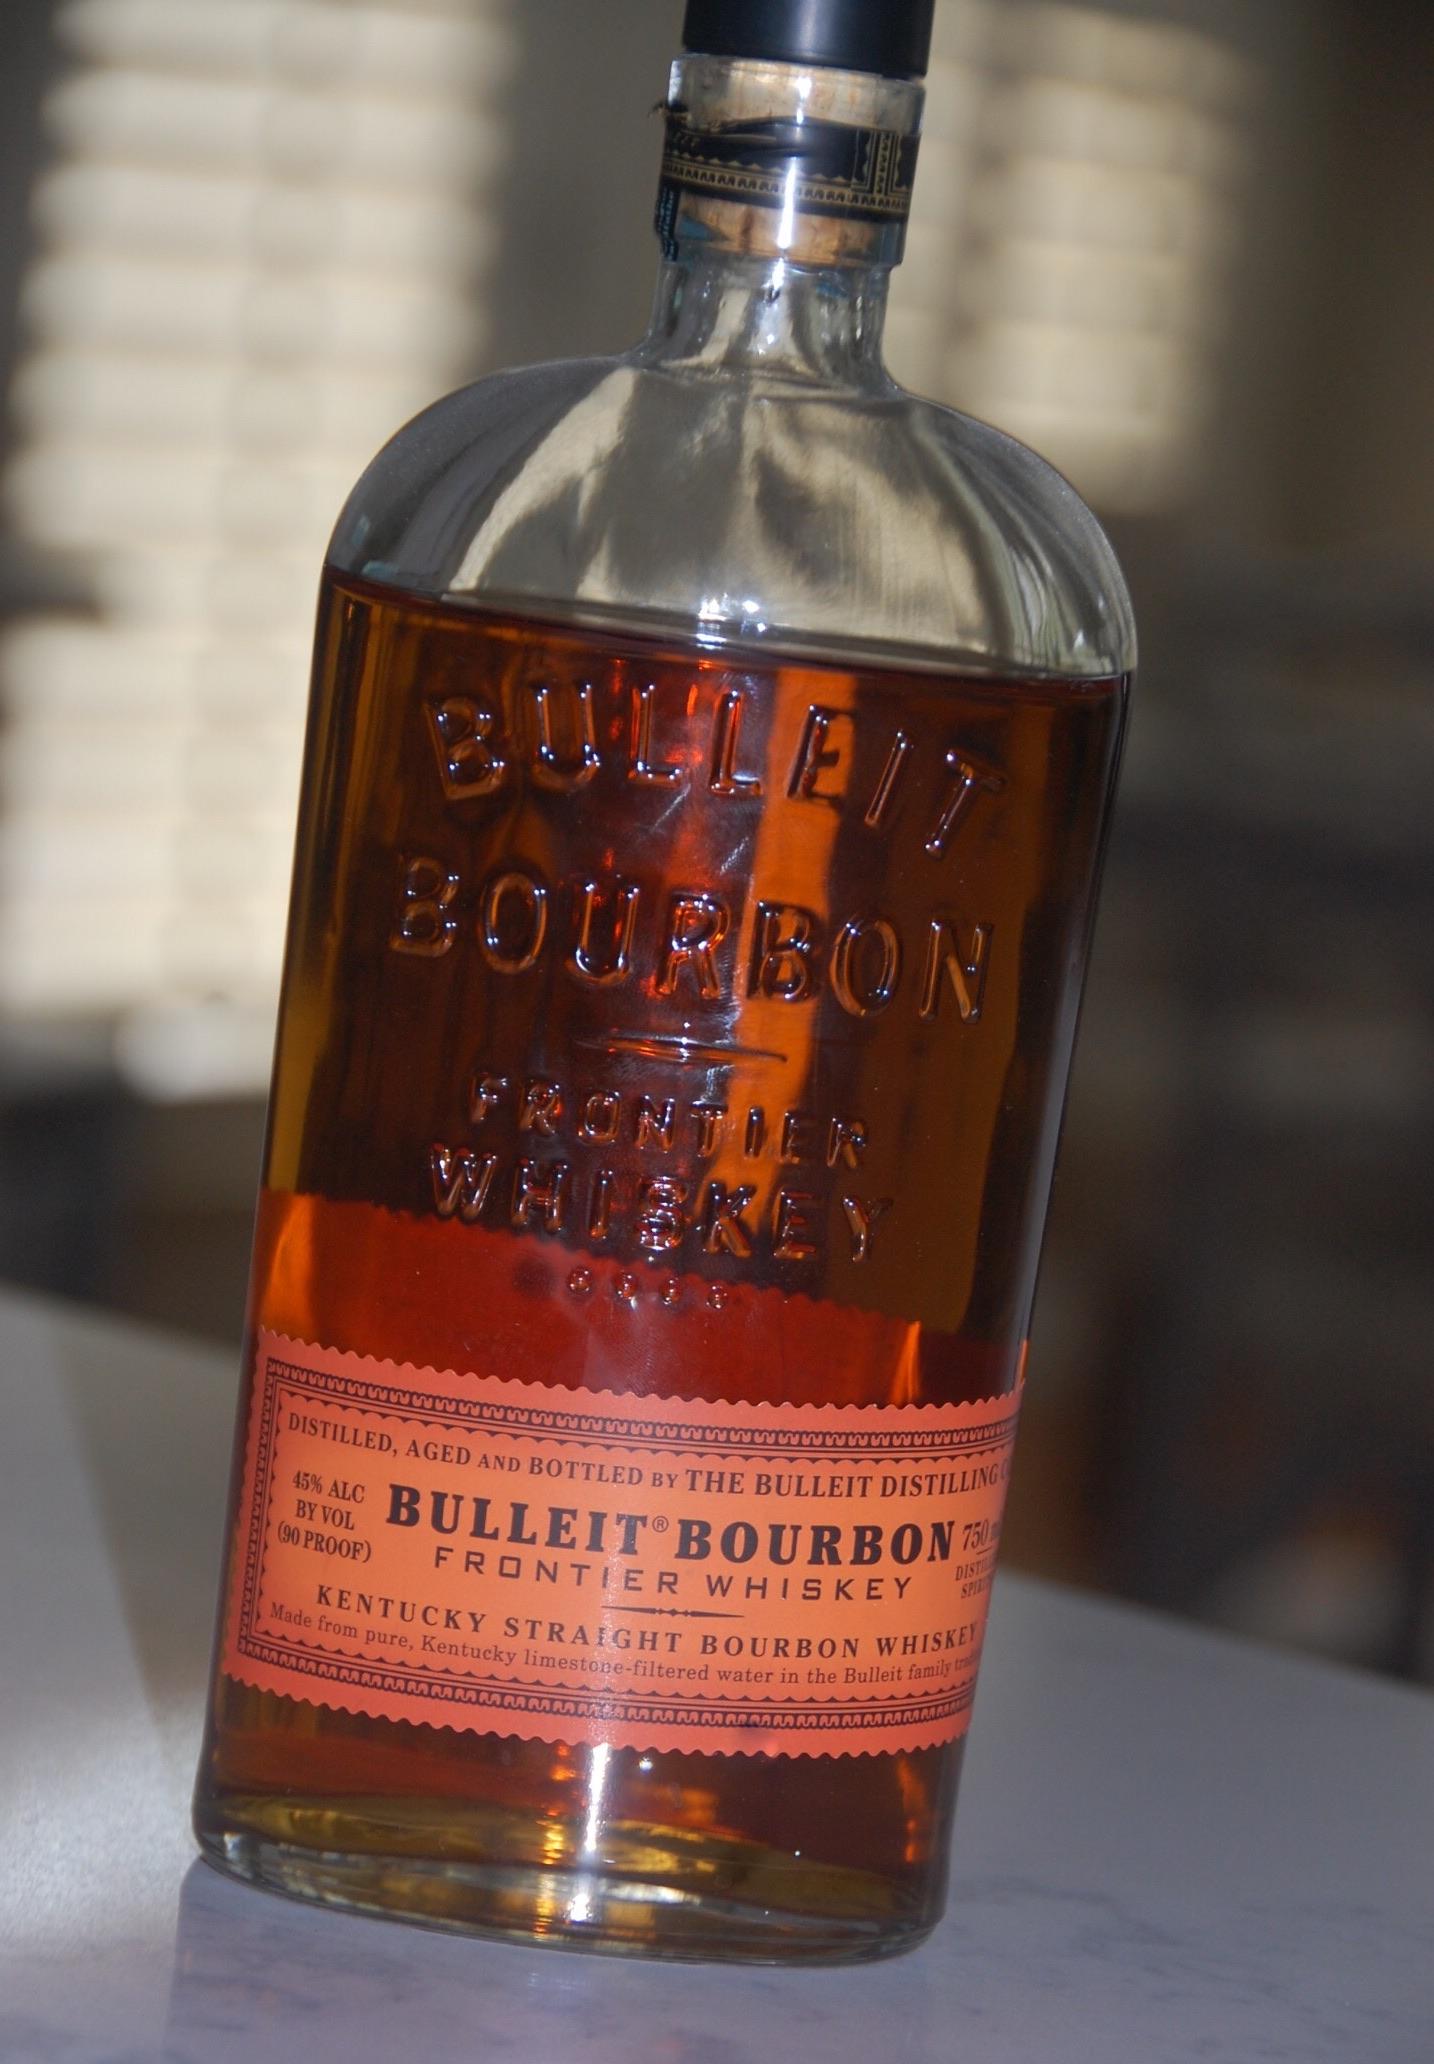 Bulleit Bourbon Frontier Kentucky Bourbon Whiskey the key ingredient to crockpot bourbon chicken recipe